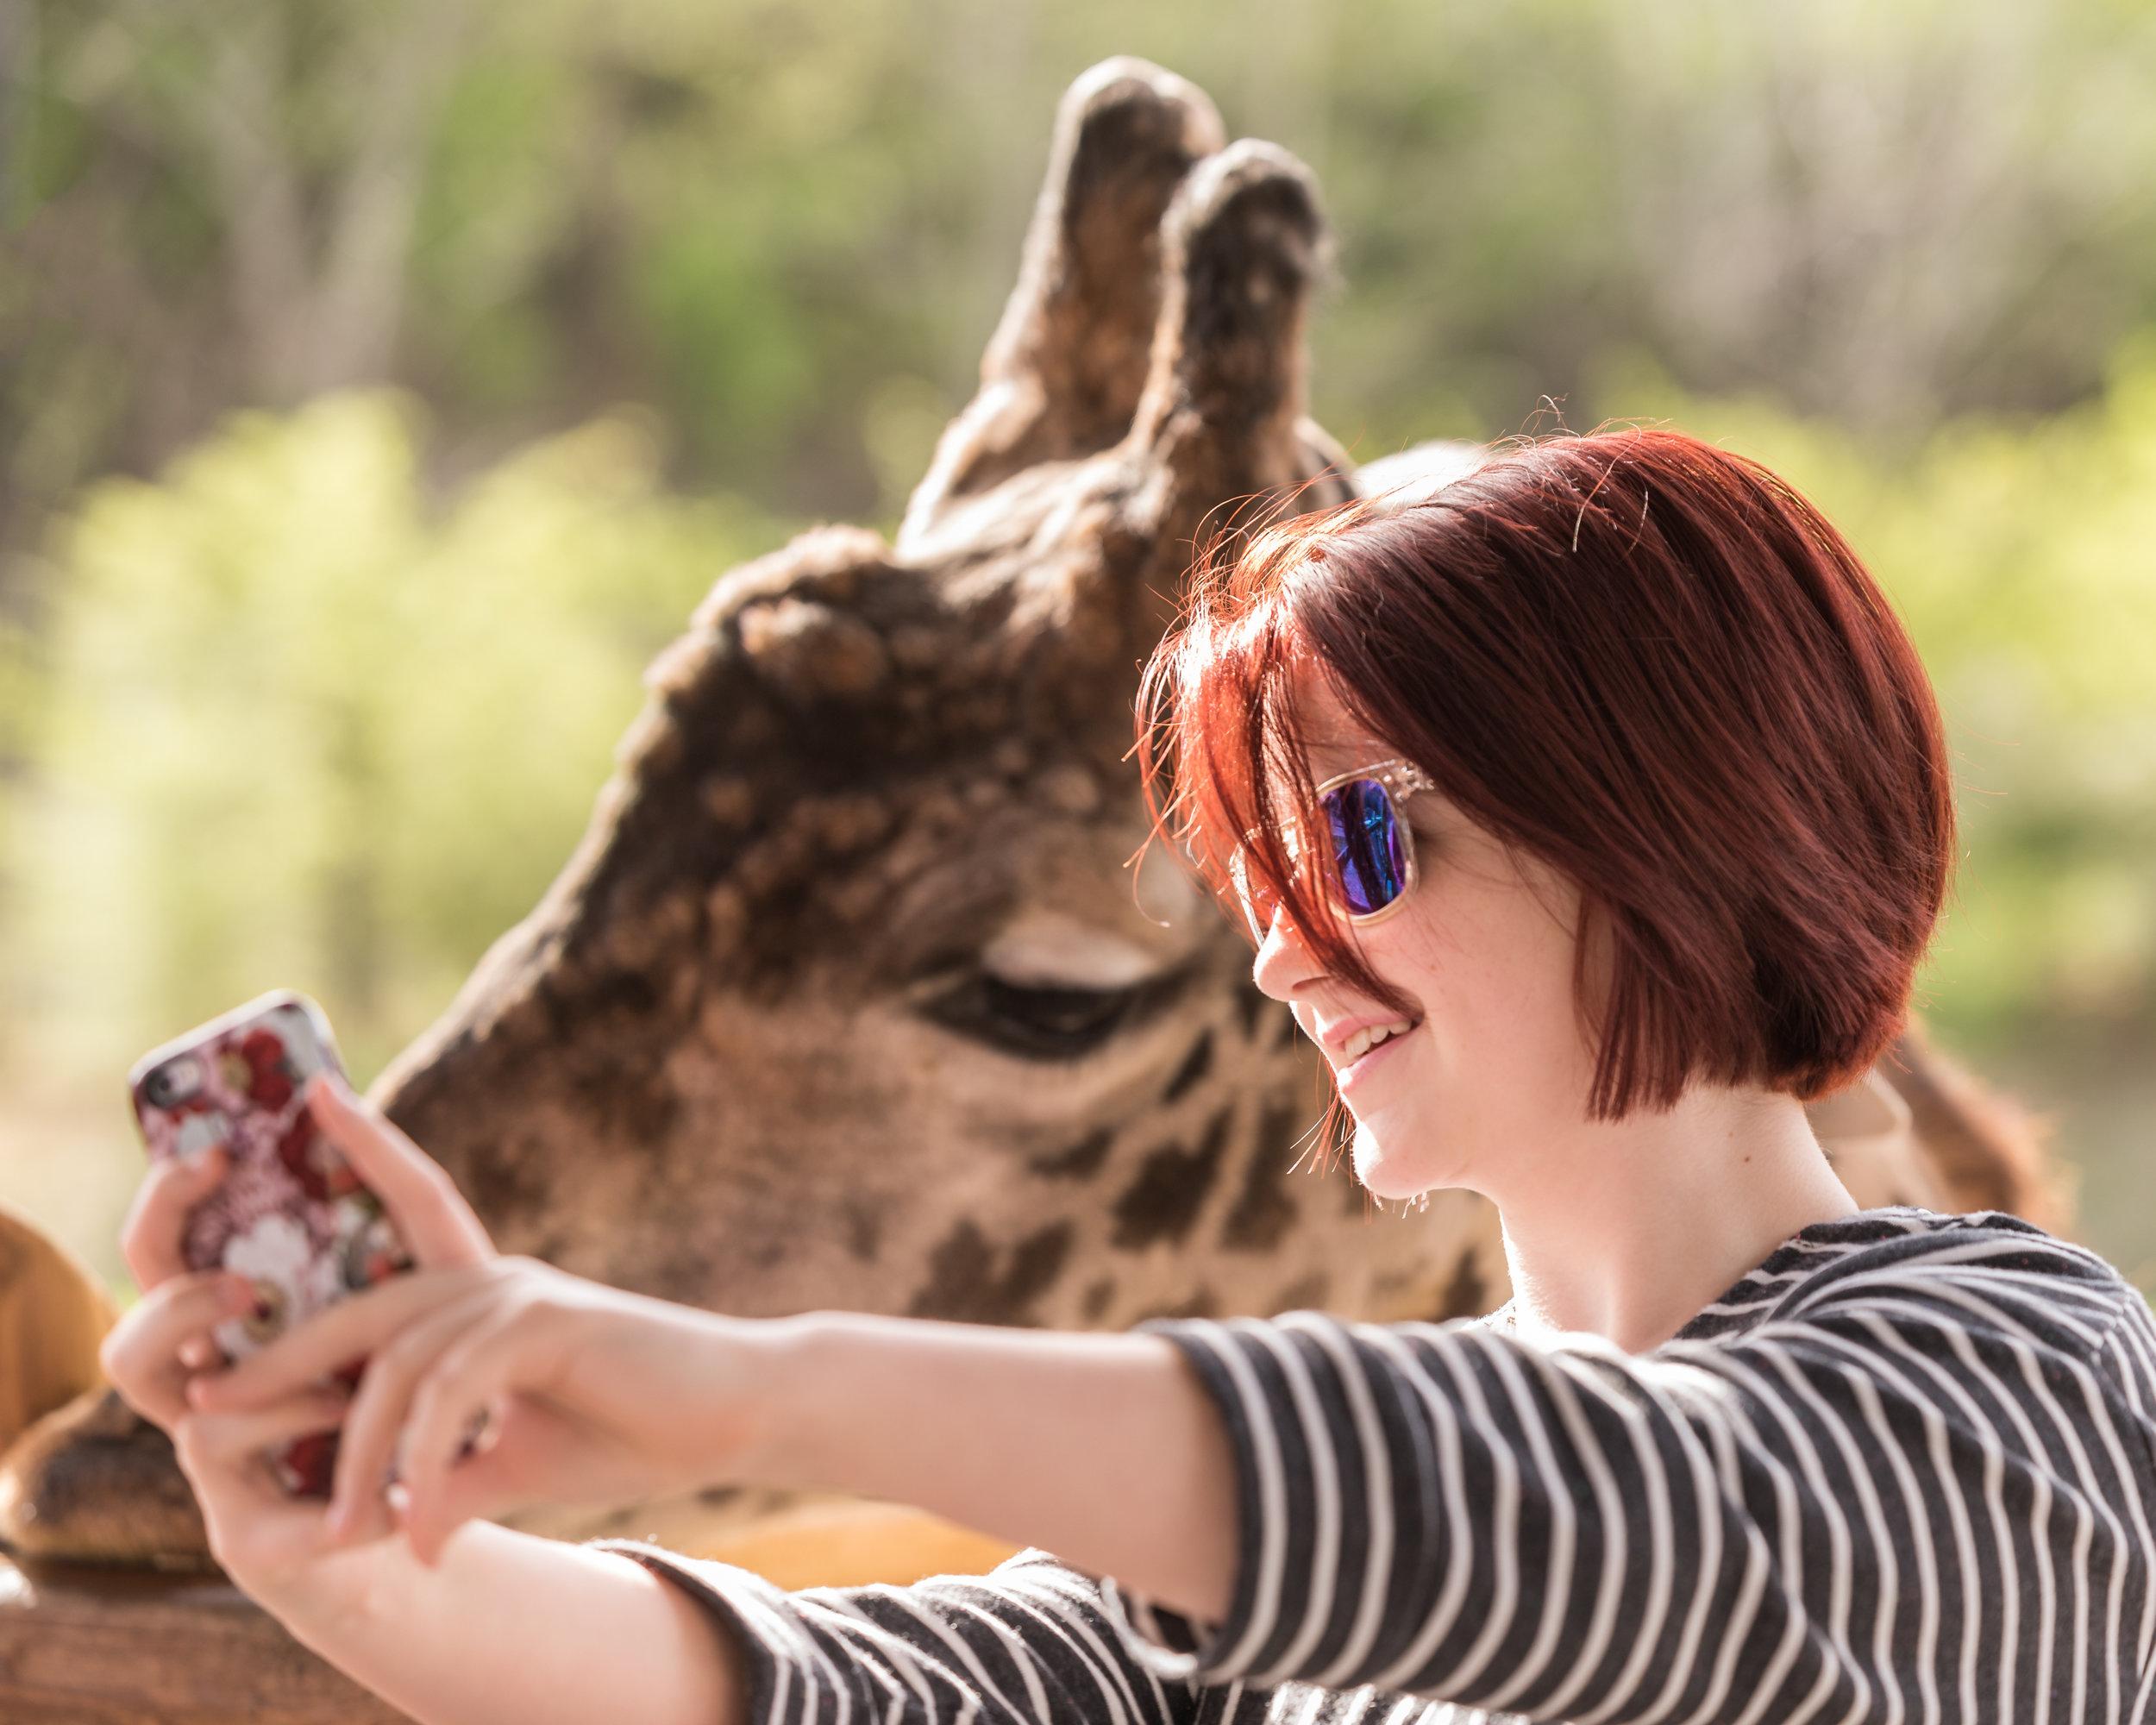 Emma and the Giraffe